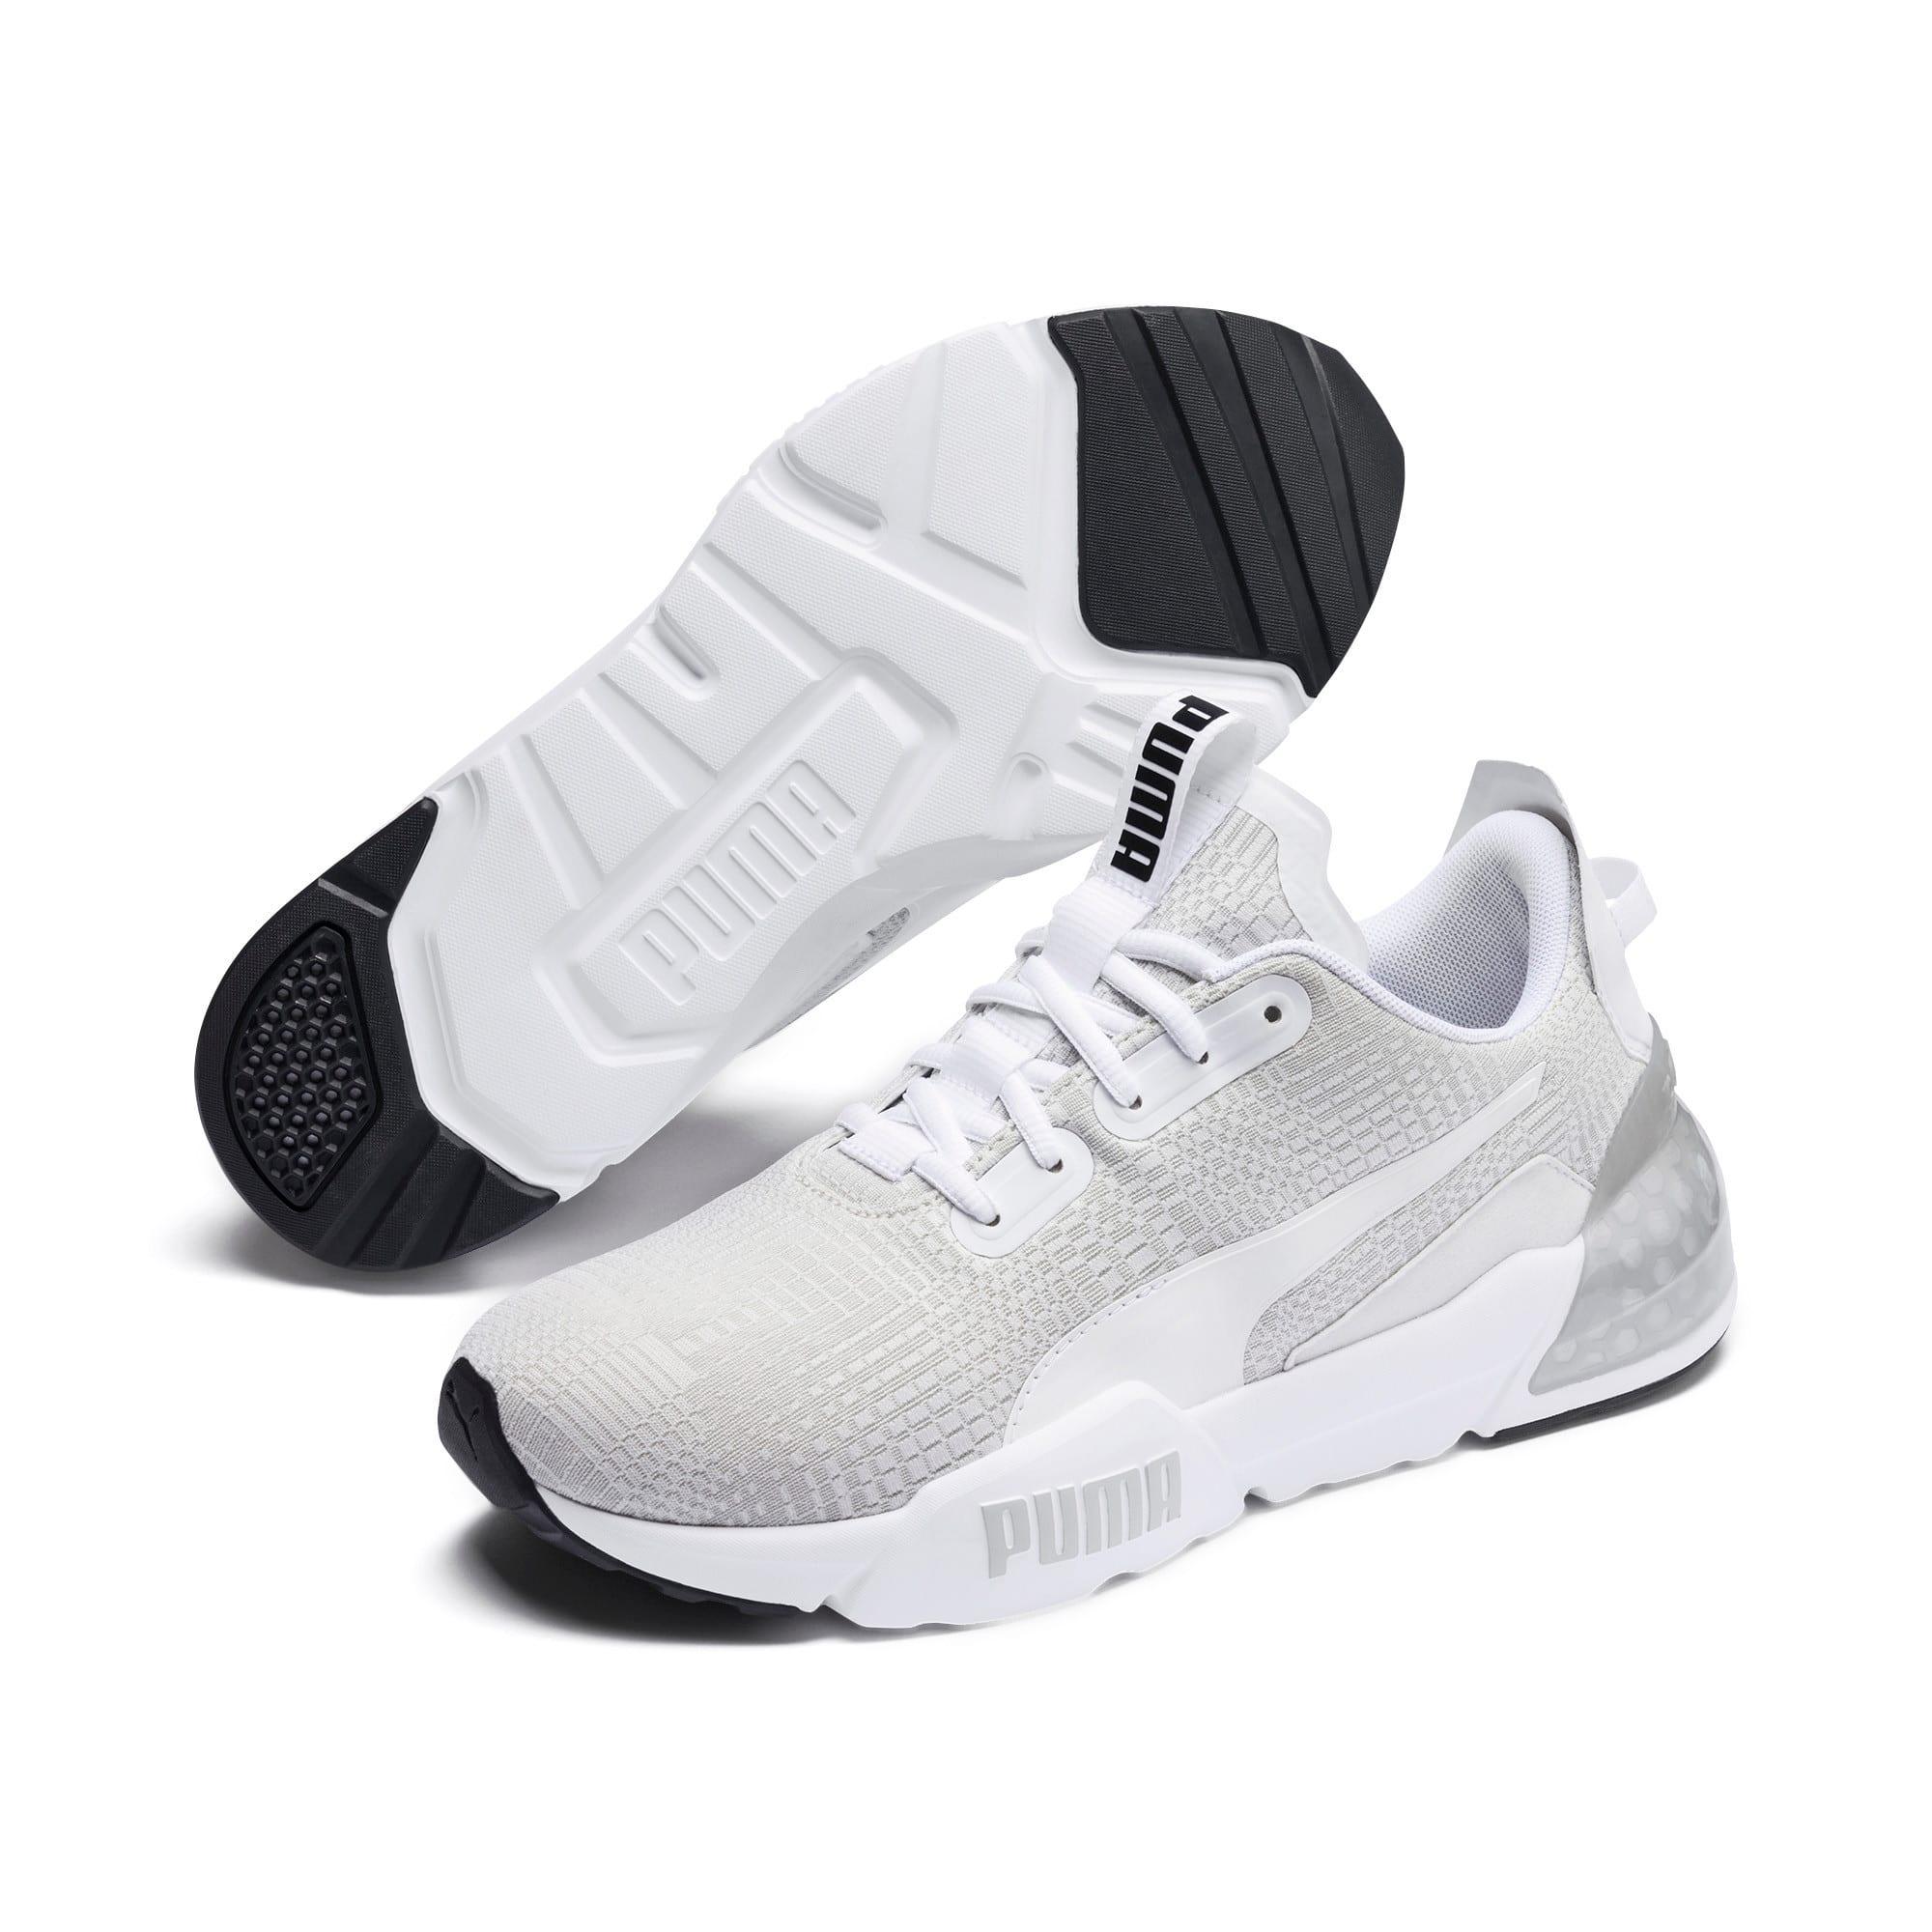 Chaussure de course CELL Phase Lights pour homme